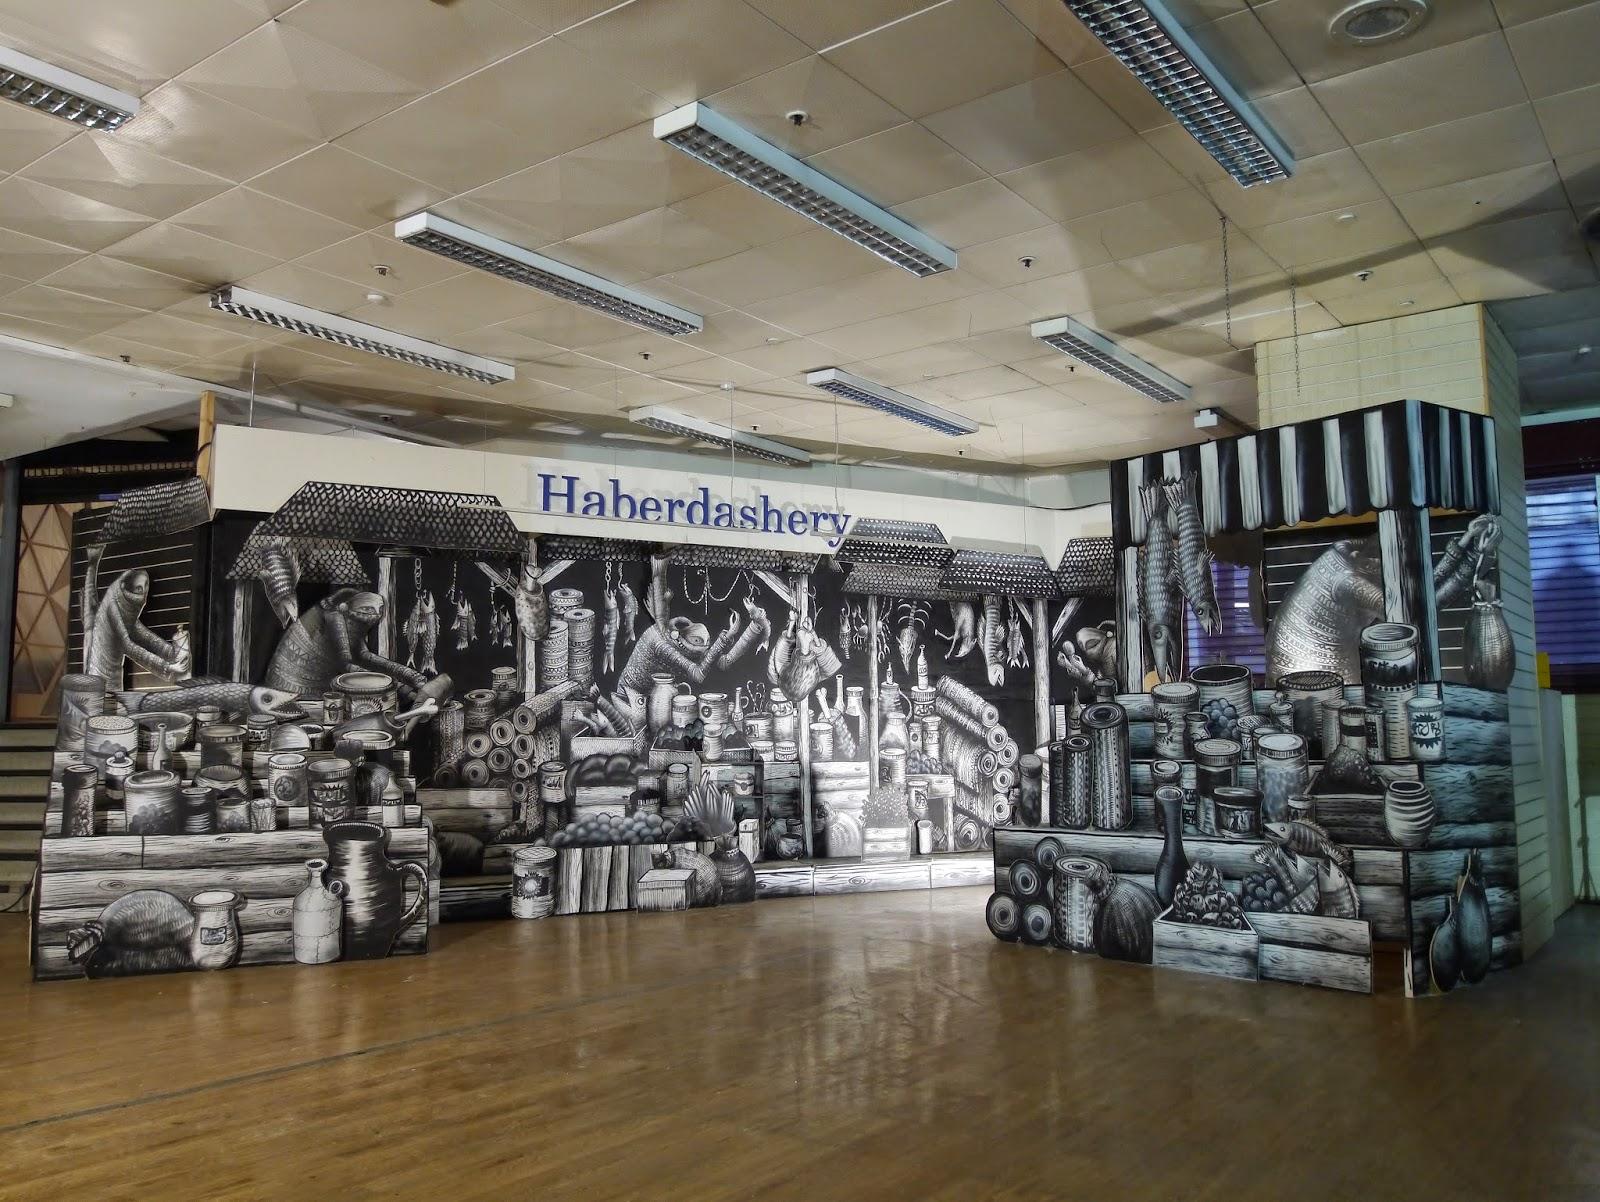 phlegm-new-installation-for-sheffield-bazaar-01